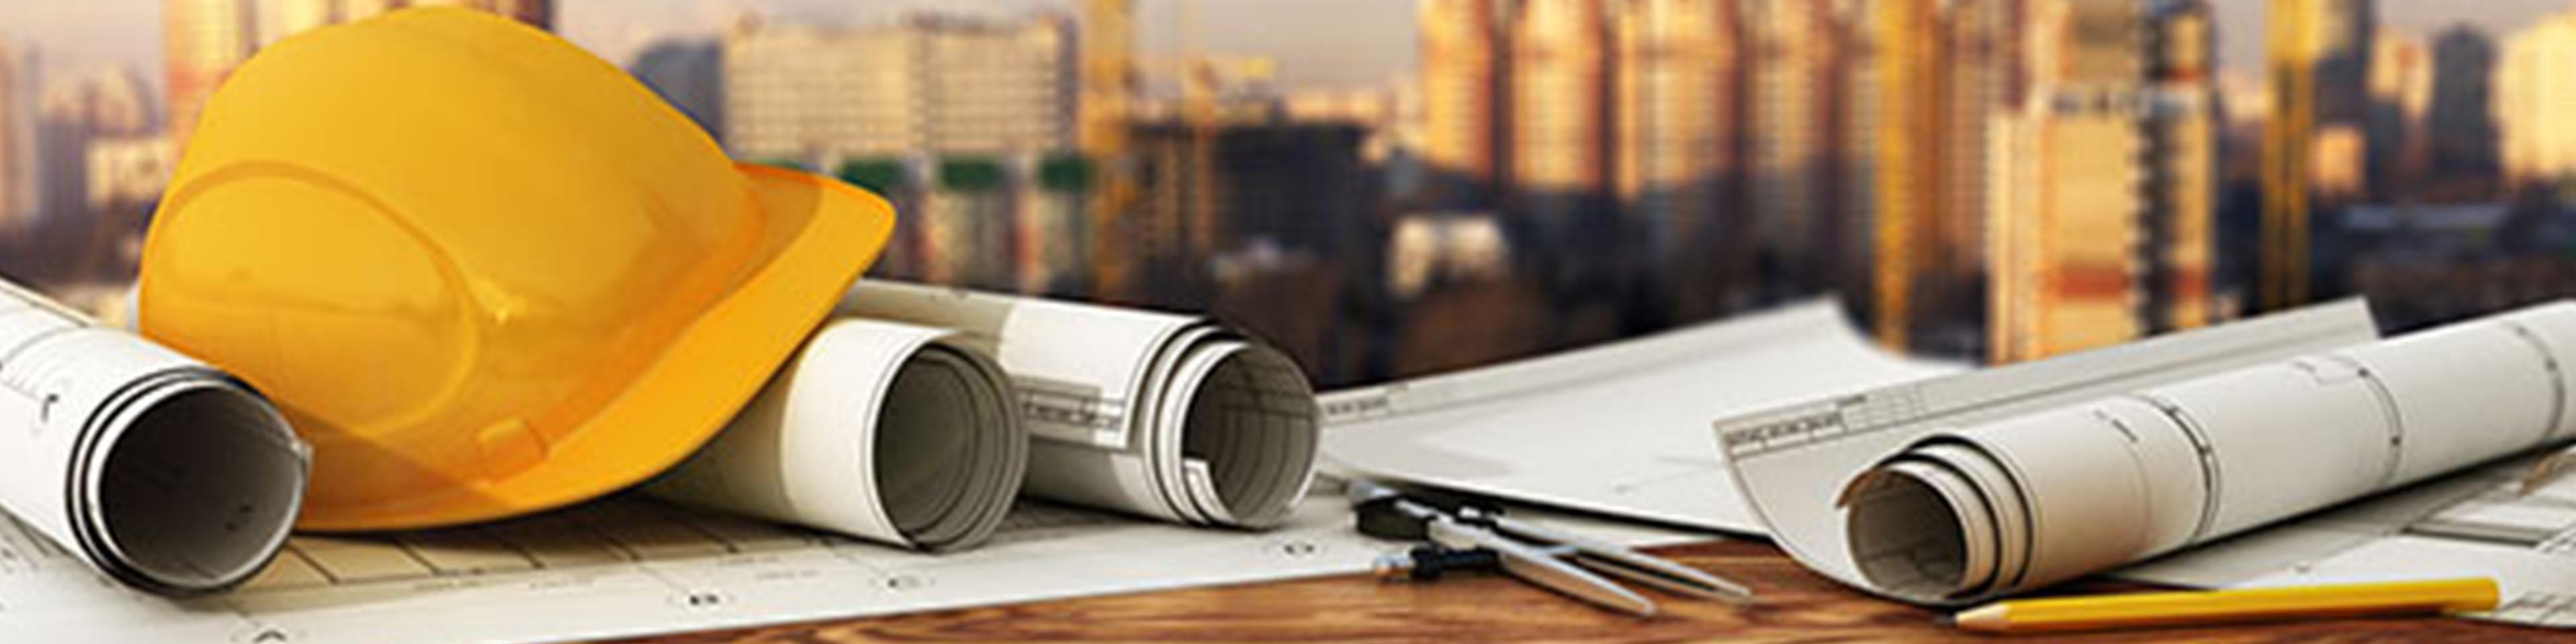 3-construction-company-business-license-pitfalls